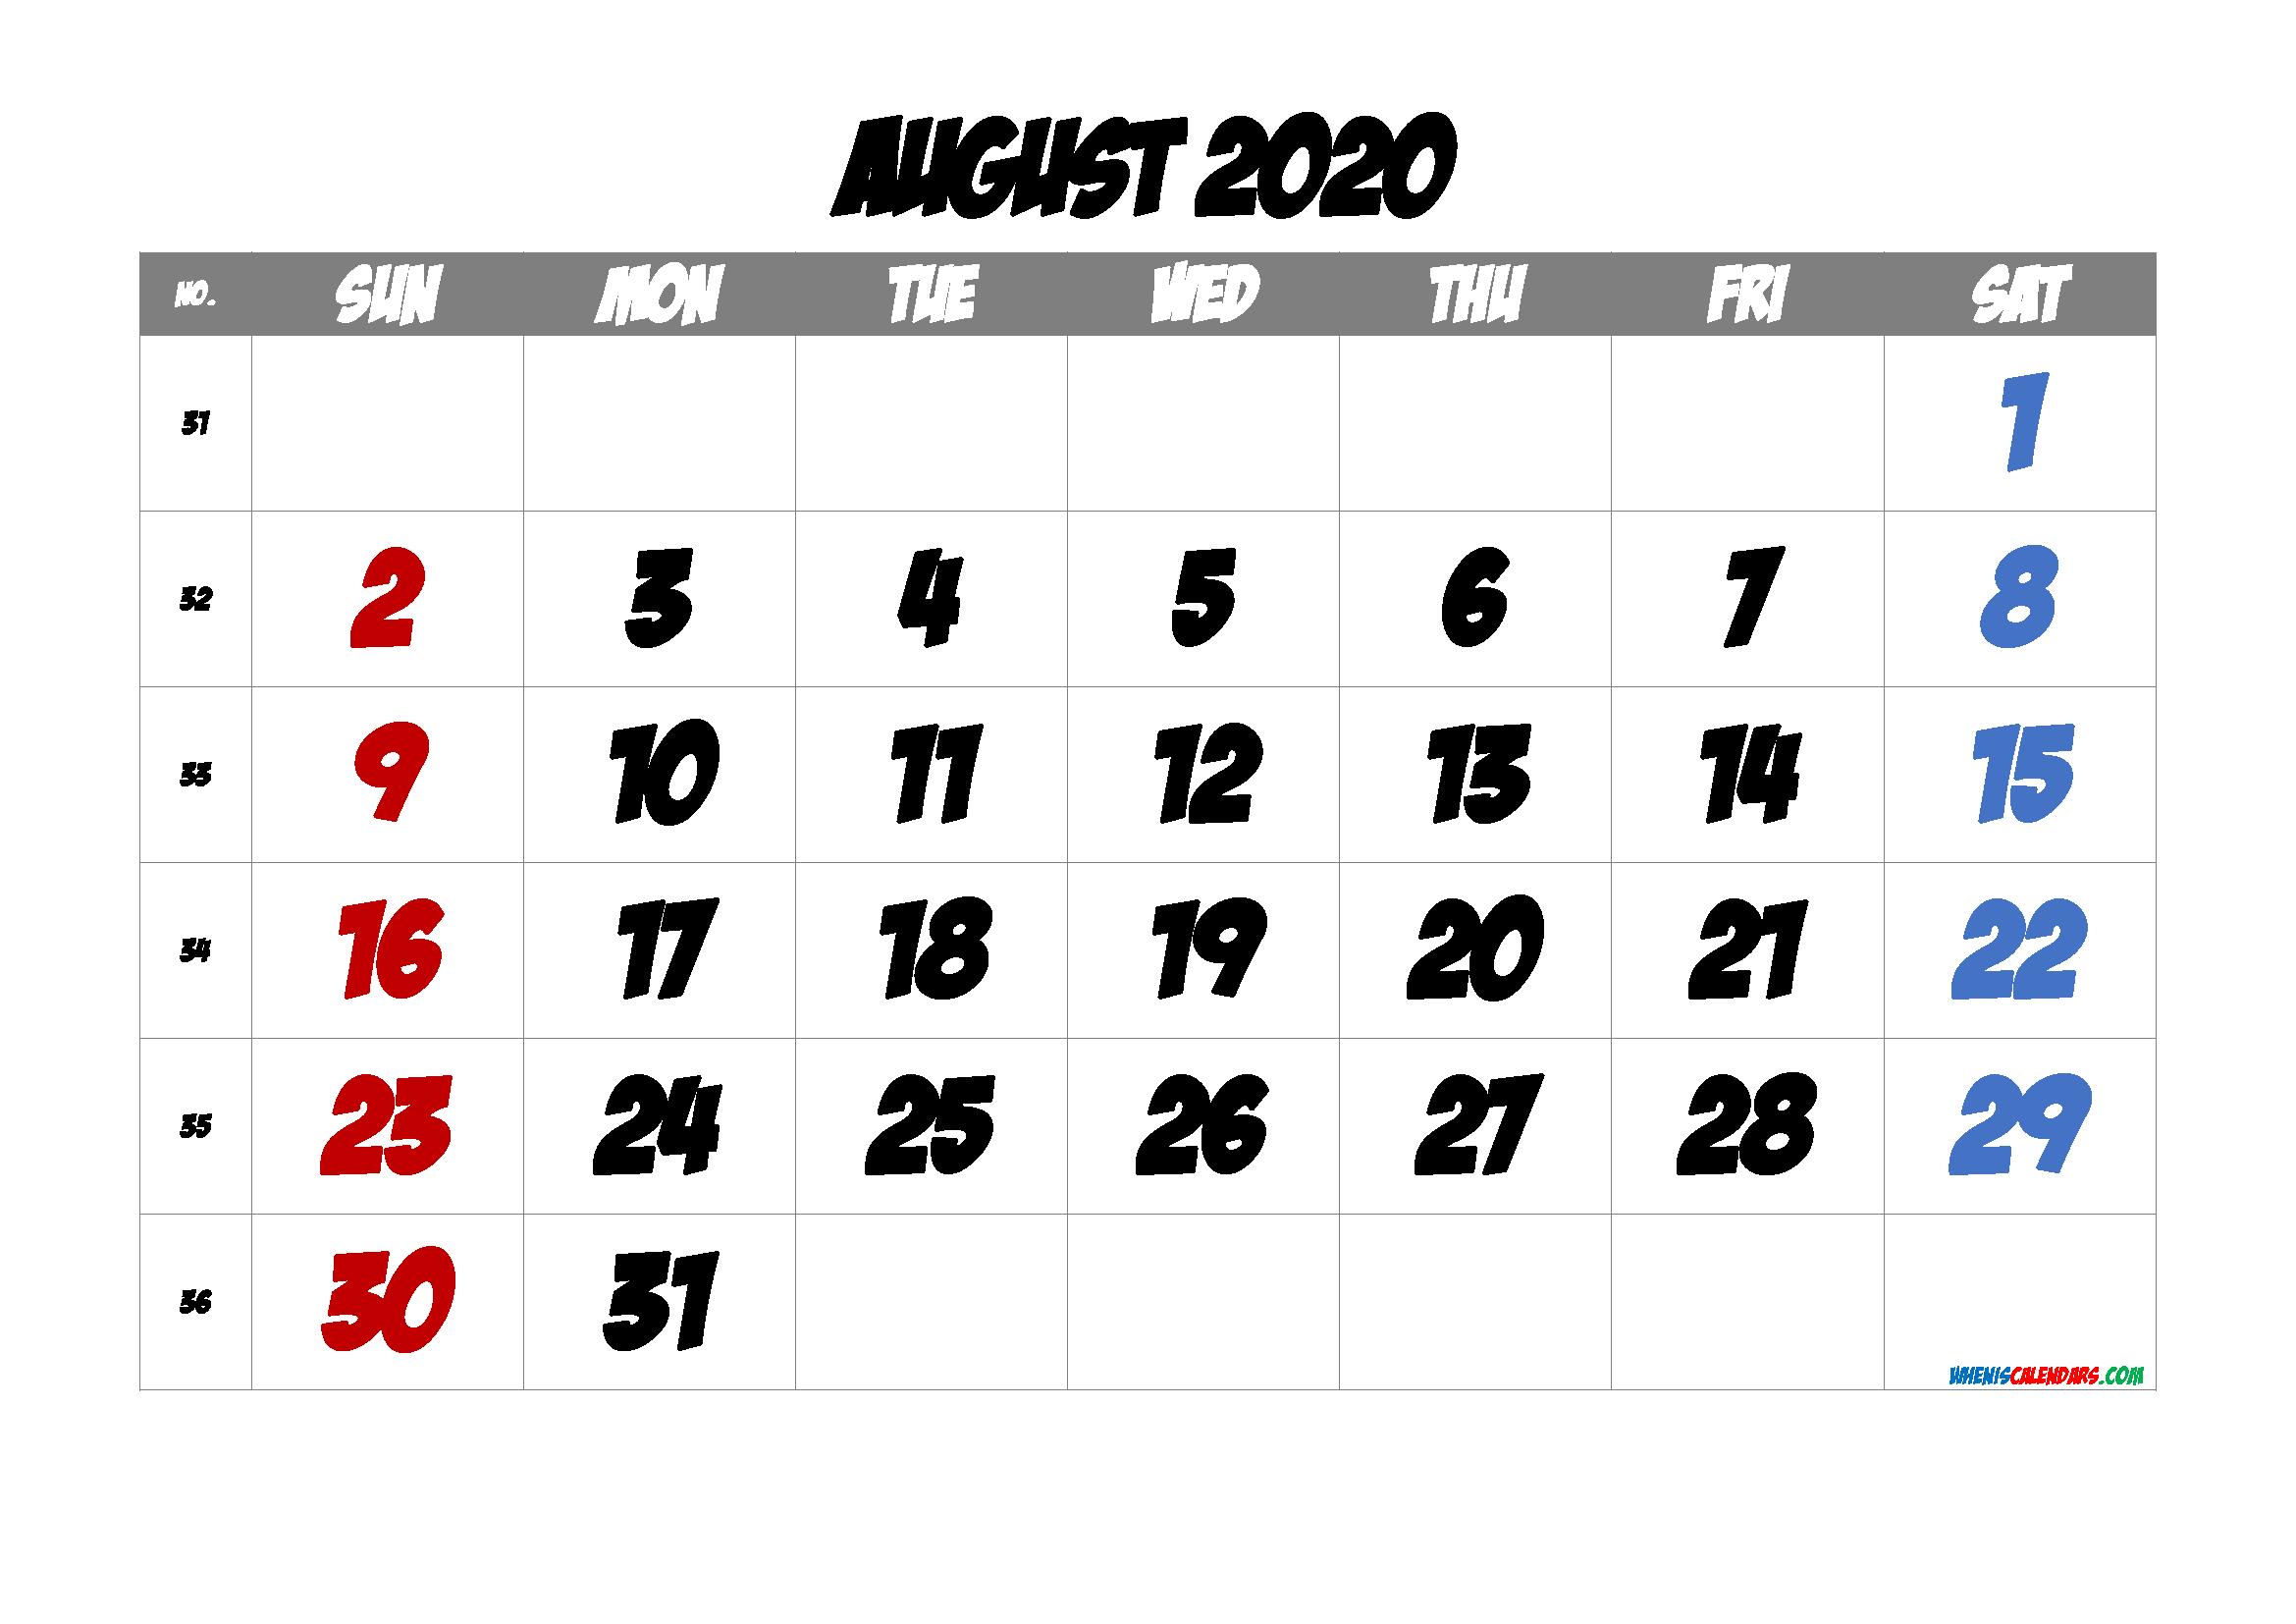 2020 August Free Printable Calendar